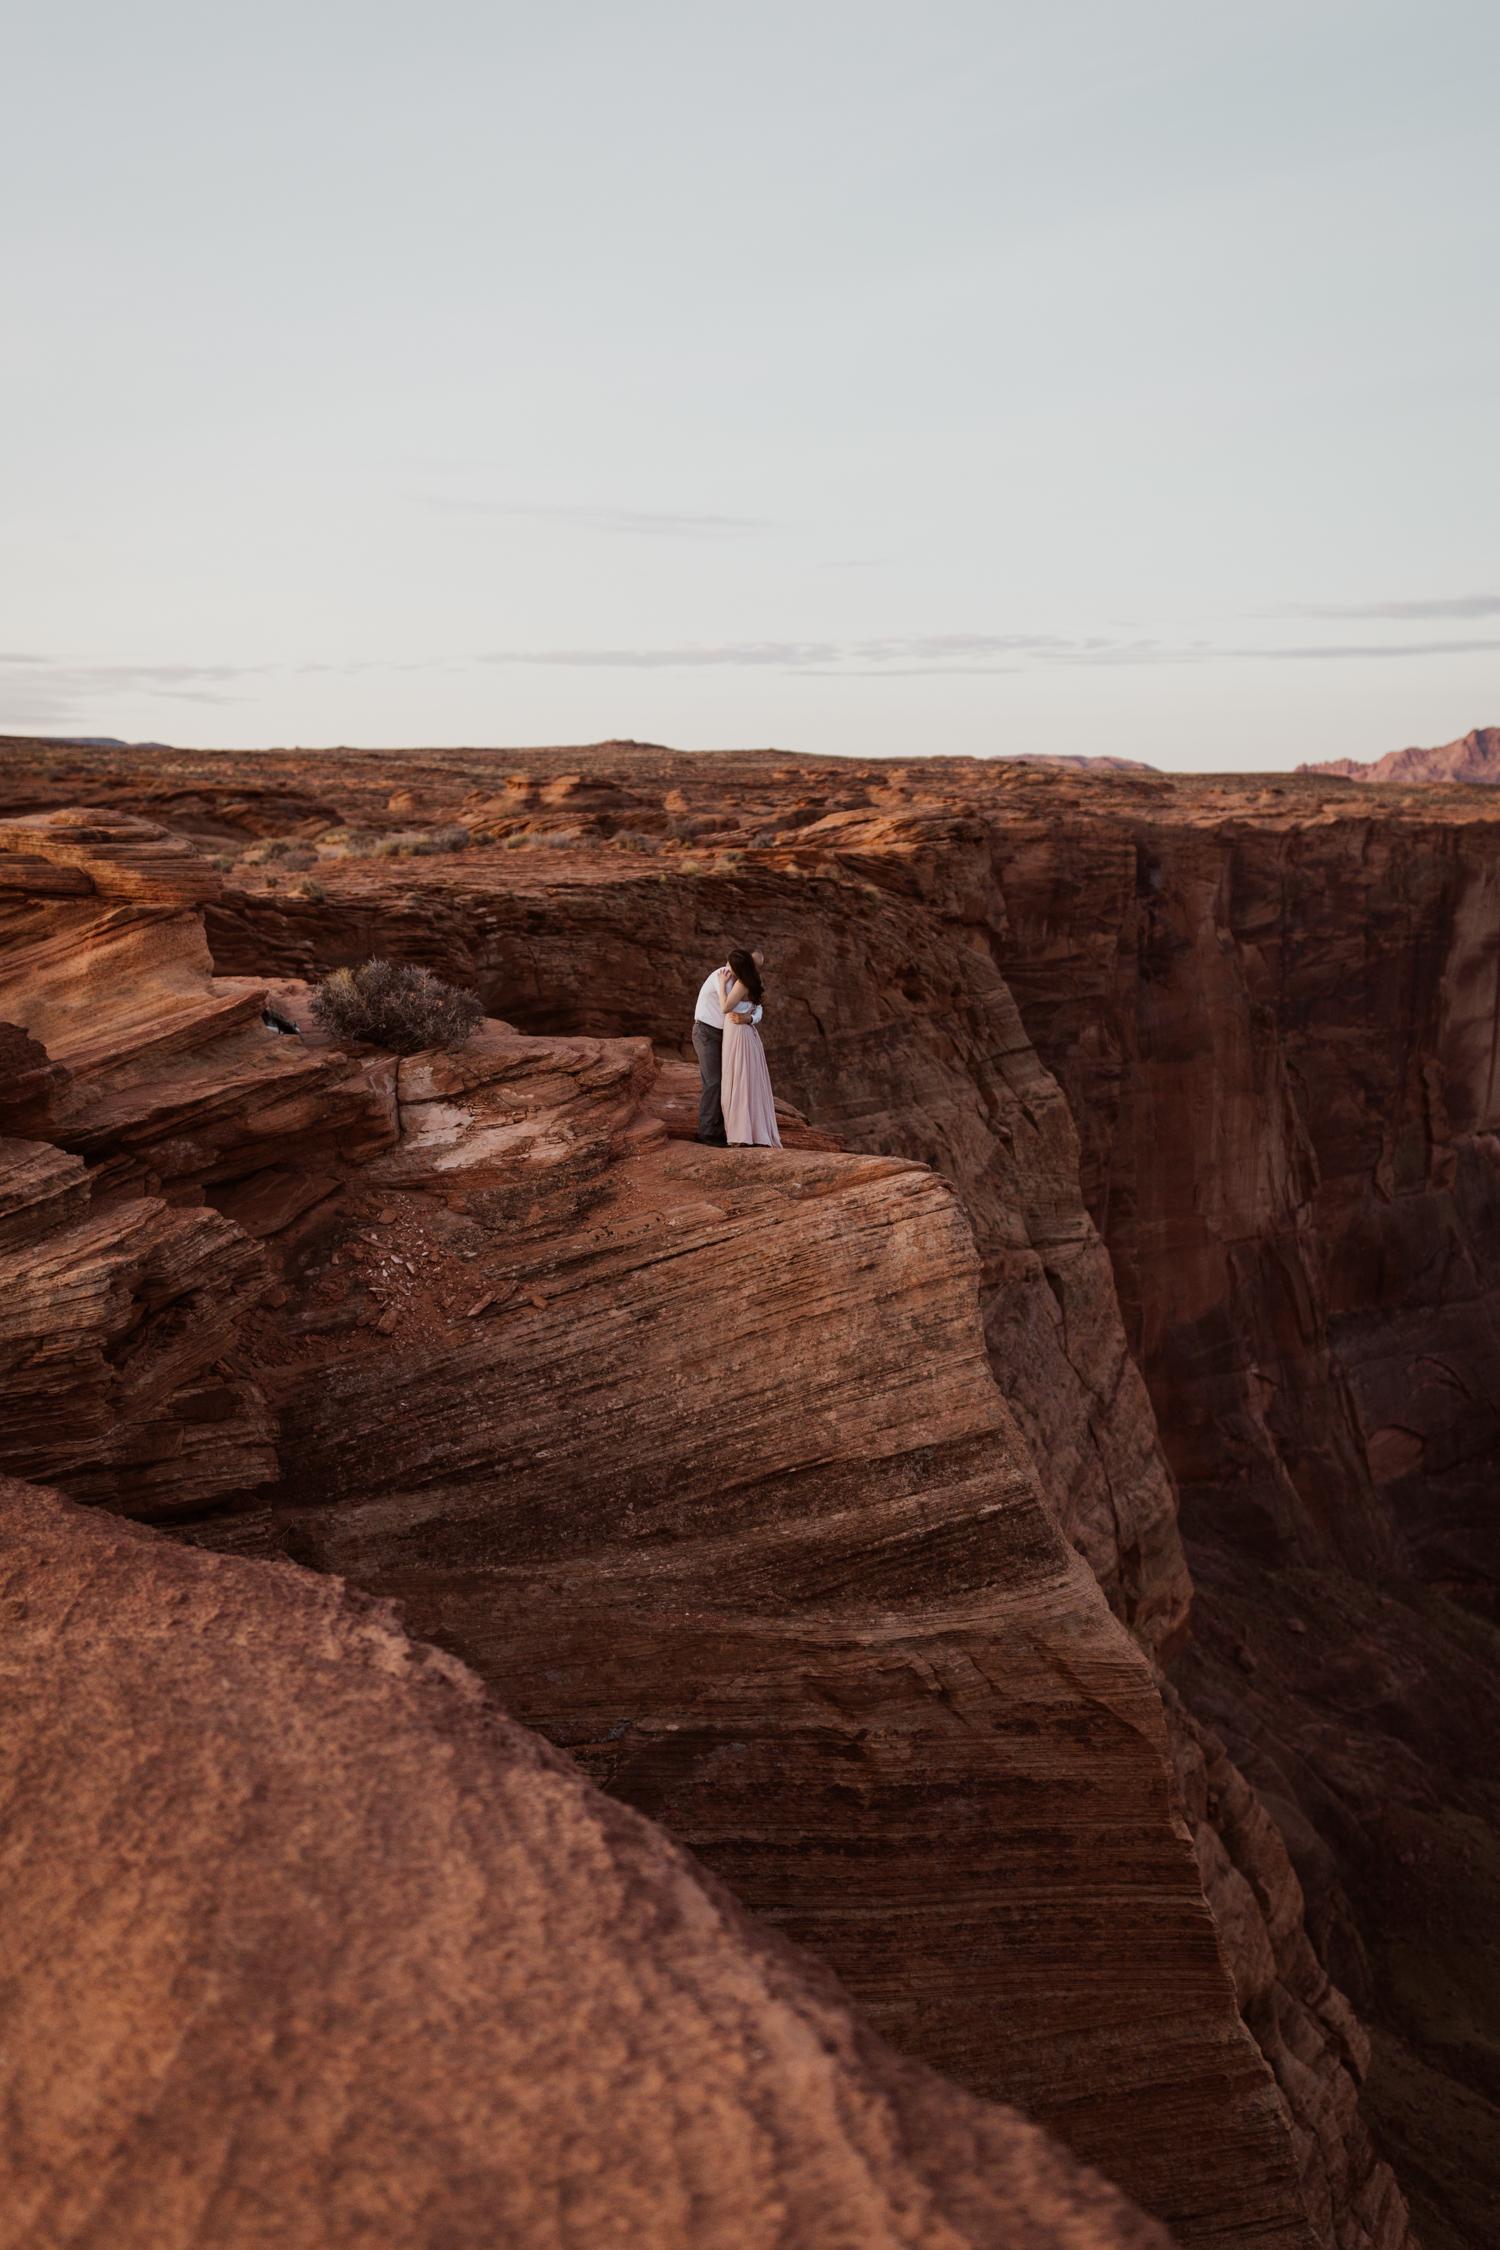 glen-canyon-arizona-adventure-engagements-1-2.jpg